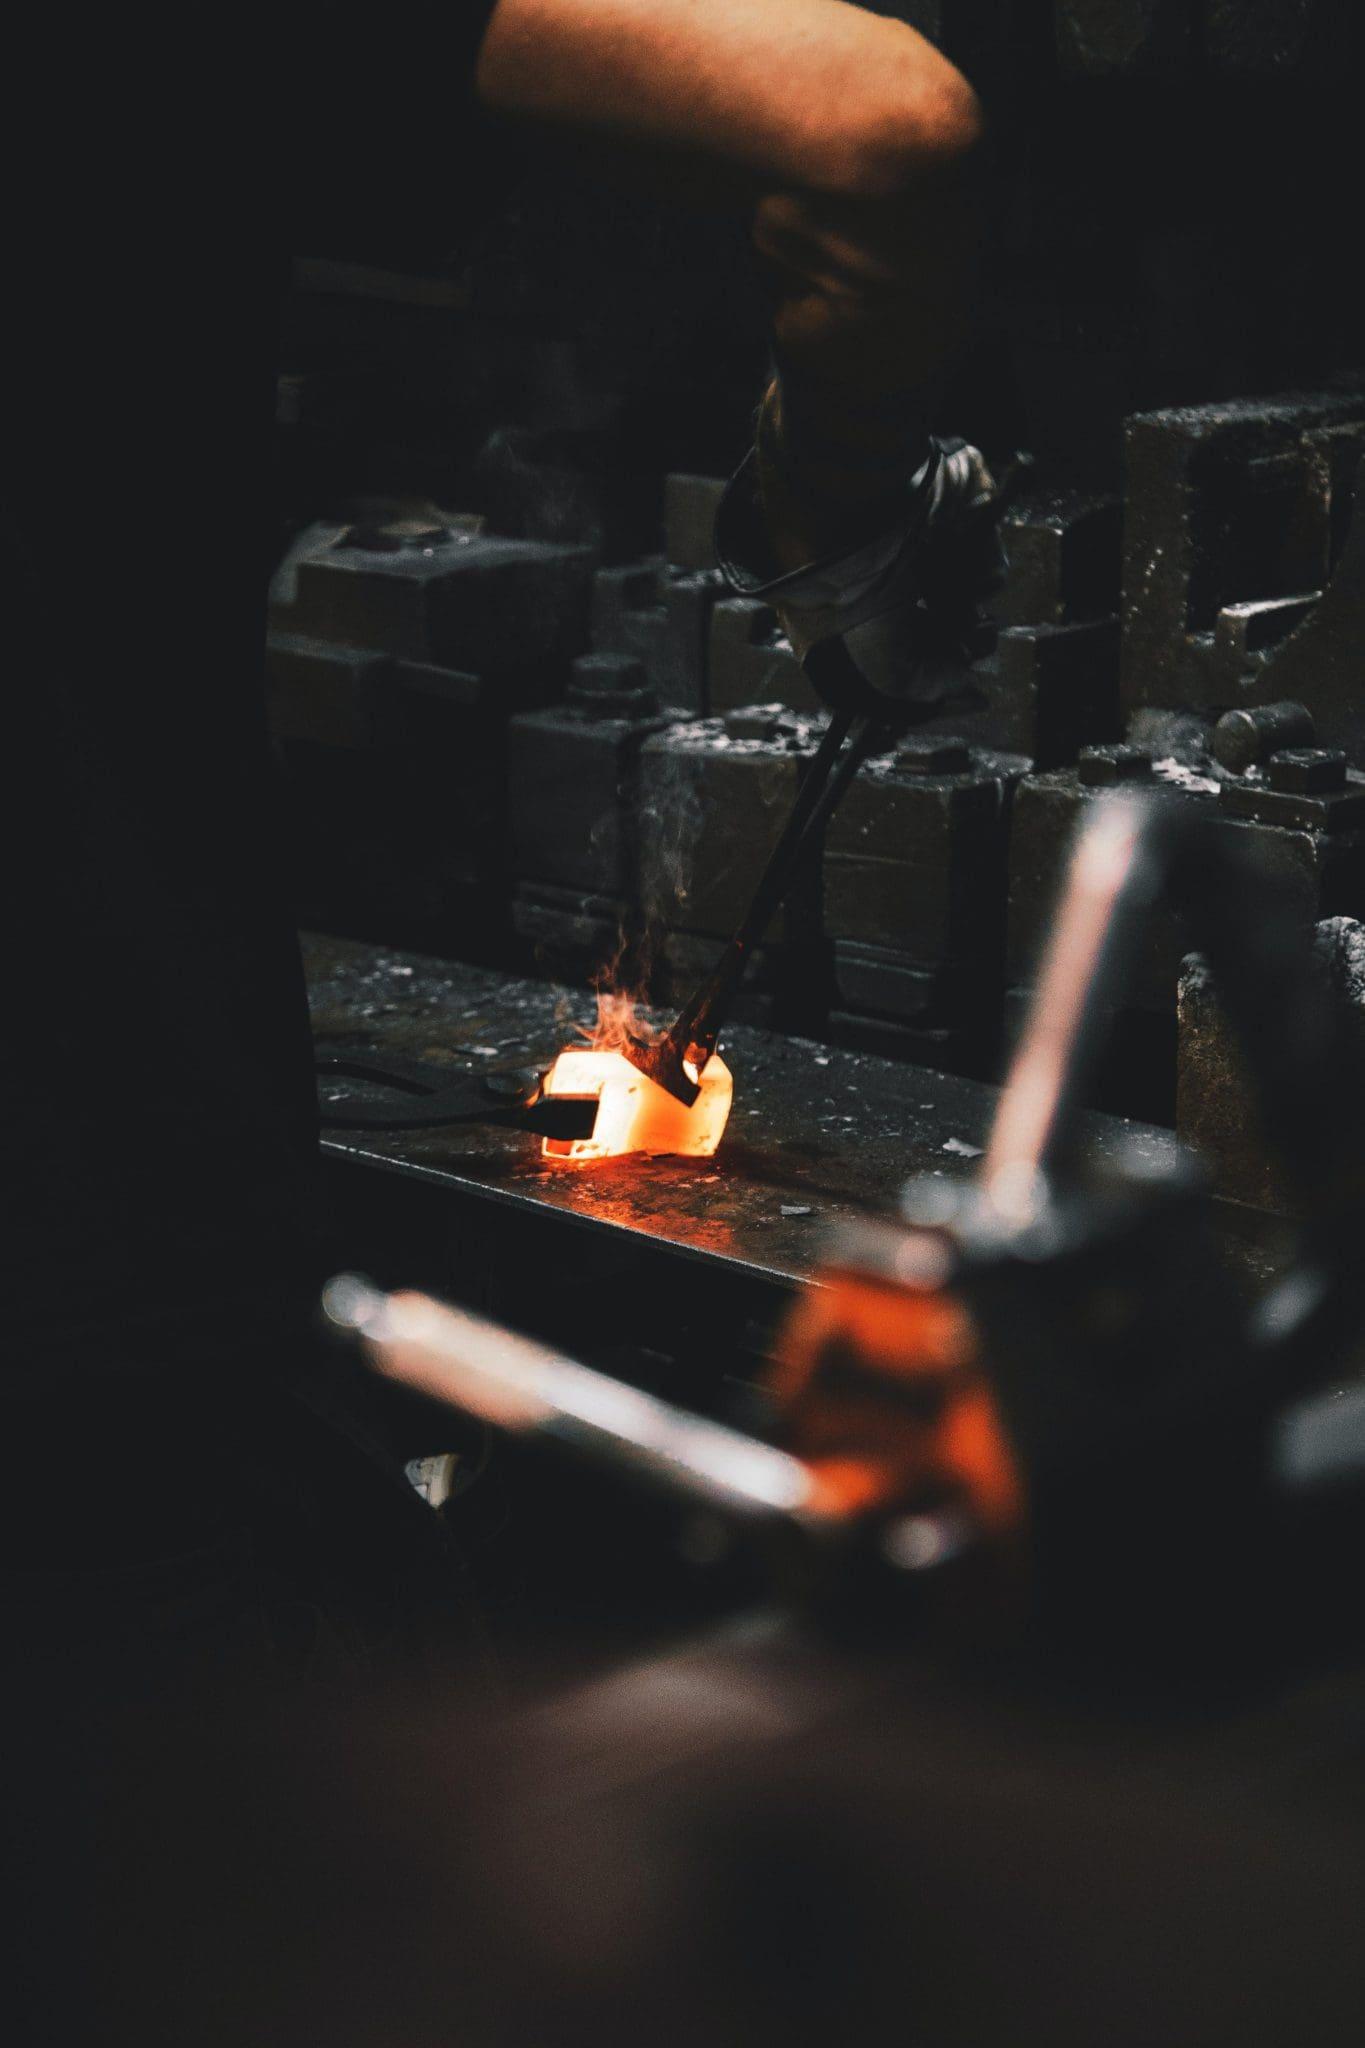 A Metal Worker Repairing Metal Casting Molds